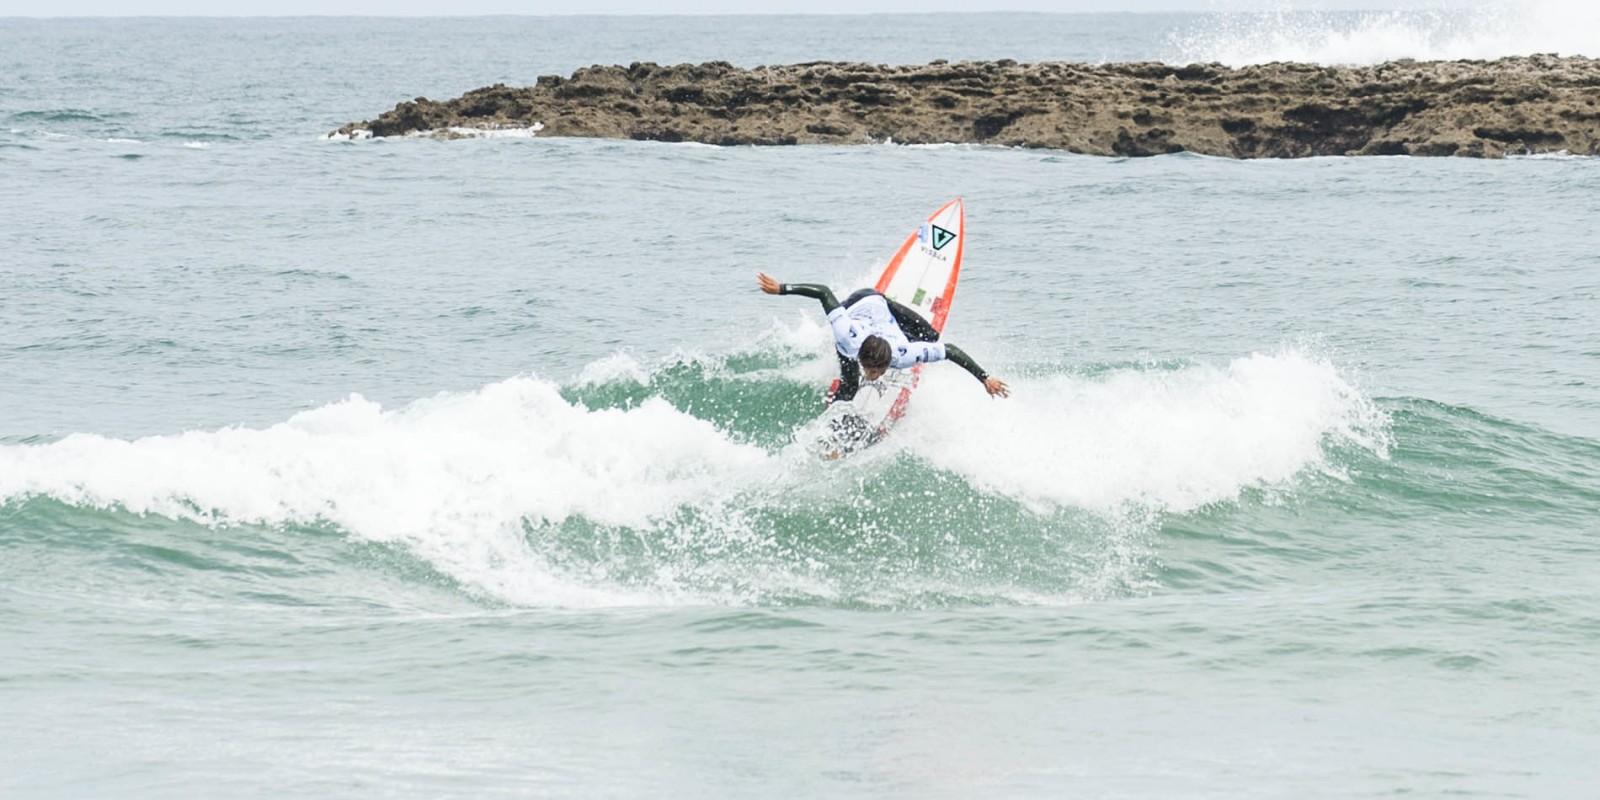 ISA, Isa world surfing games, biarritz, francia, surf, jhony corzo